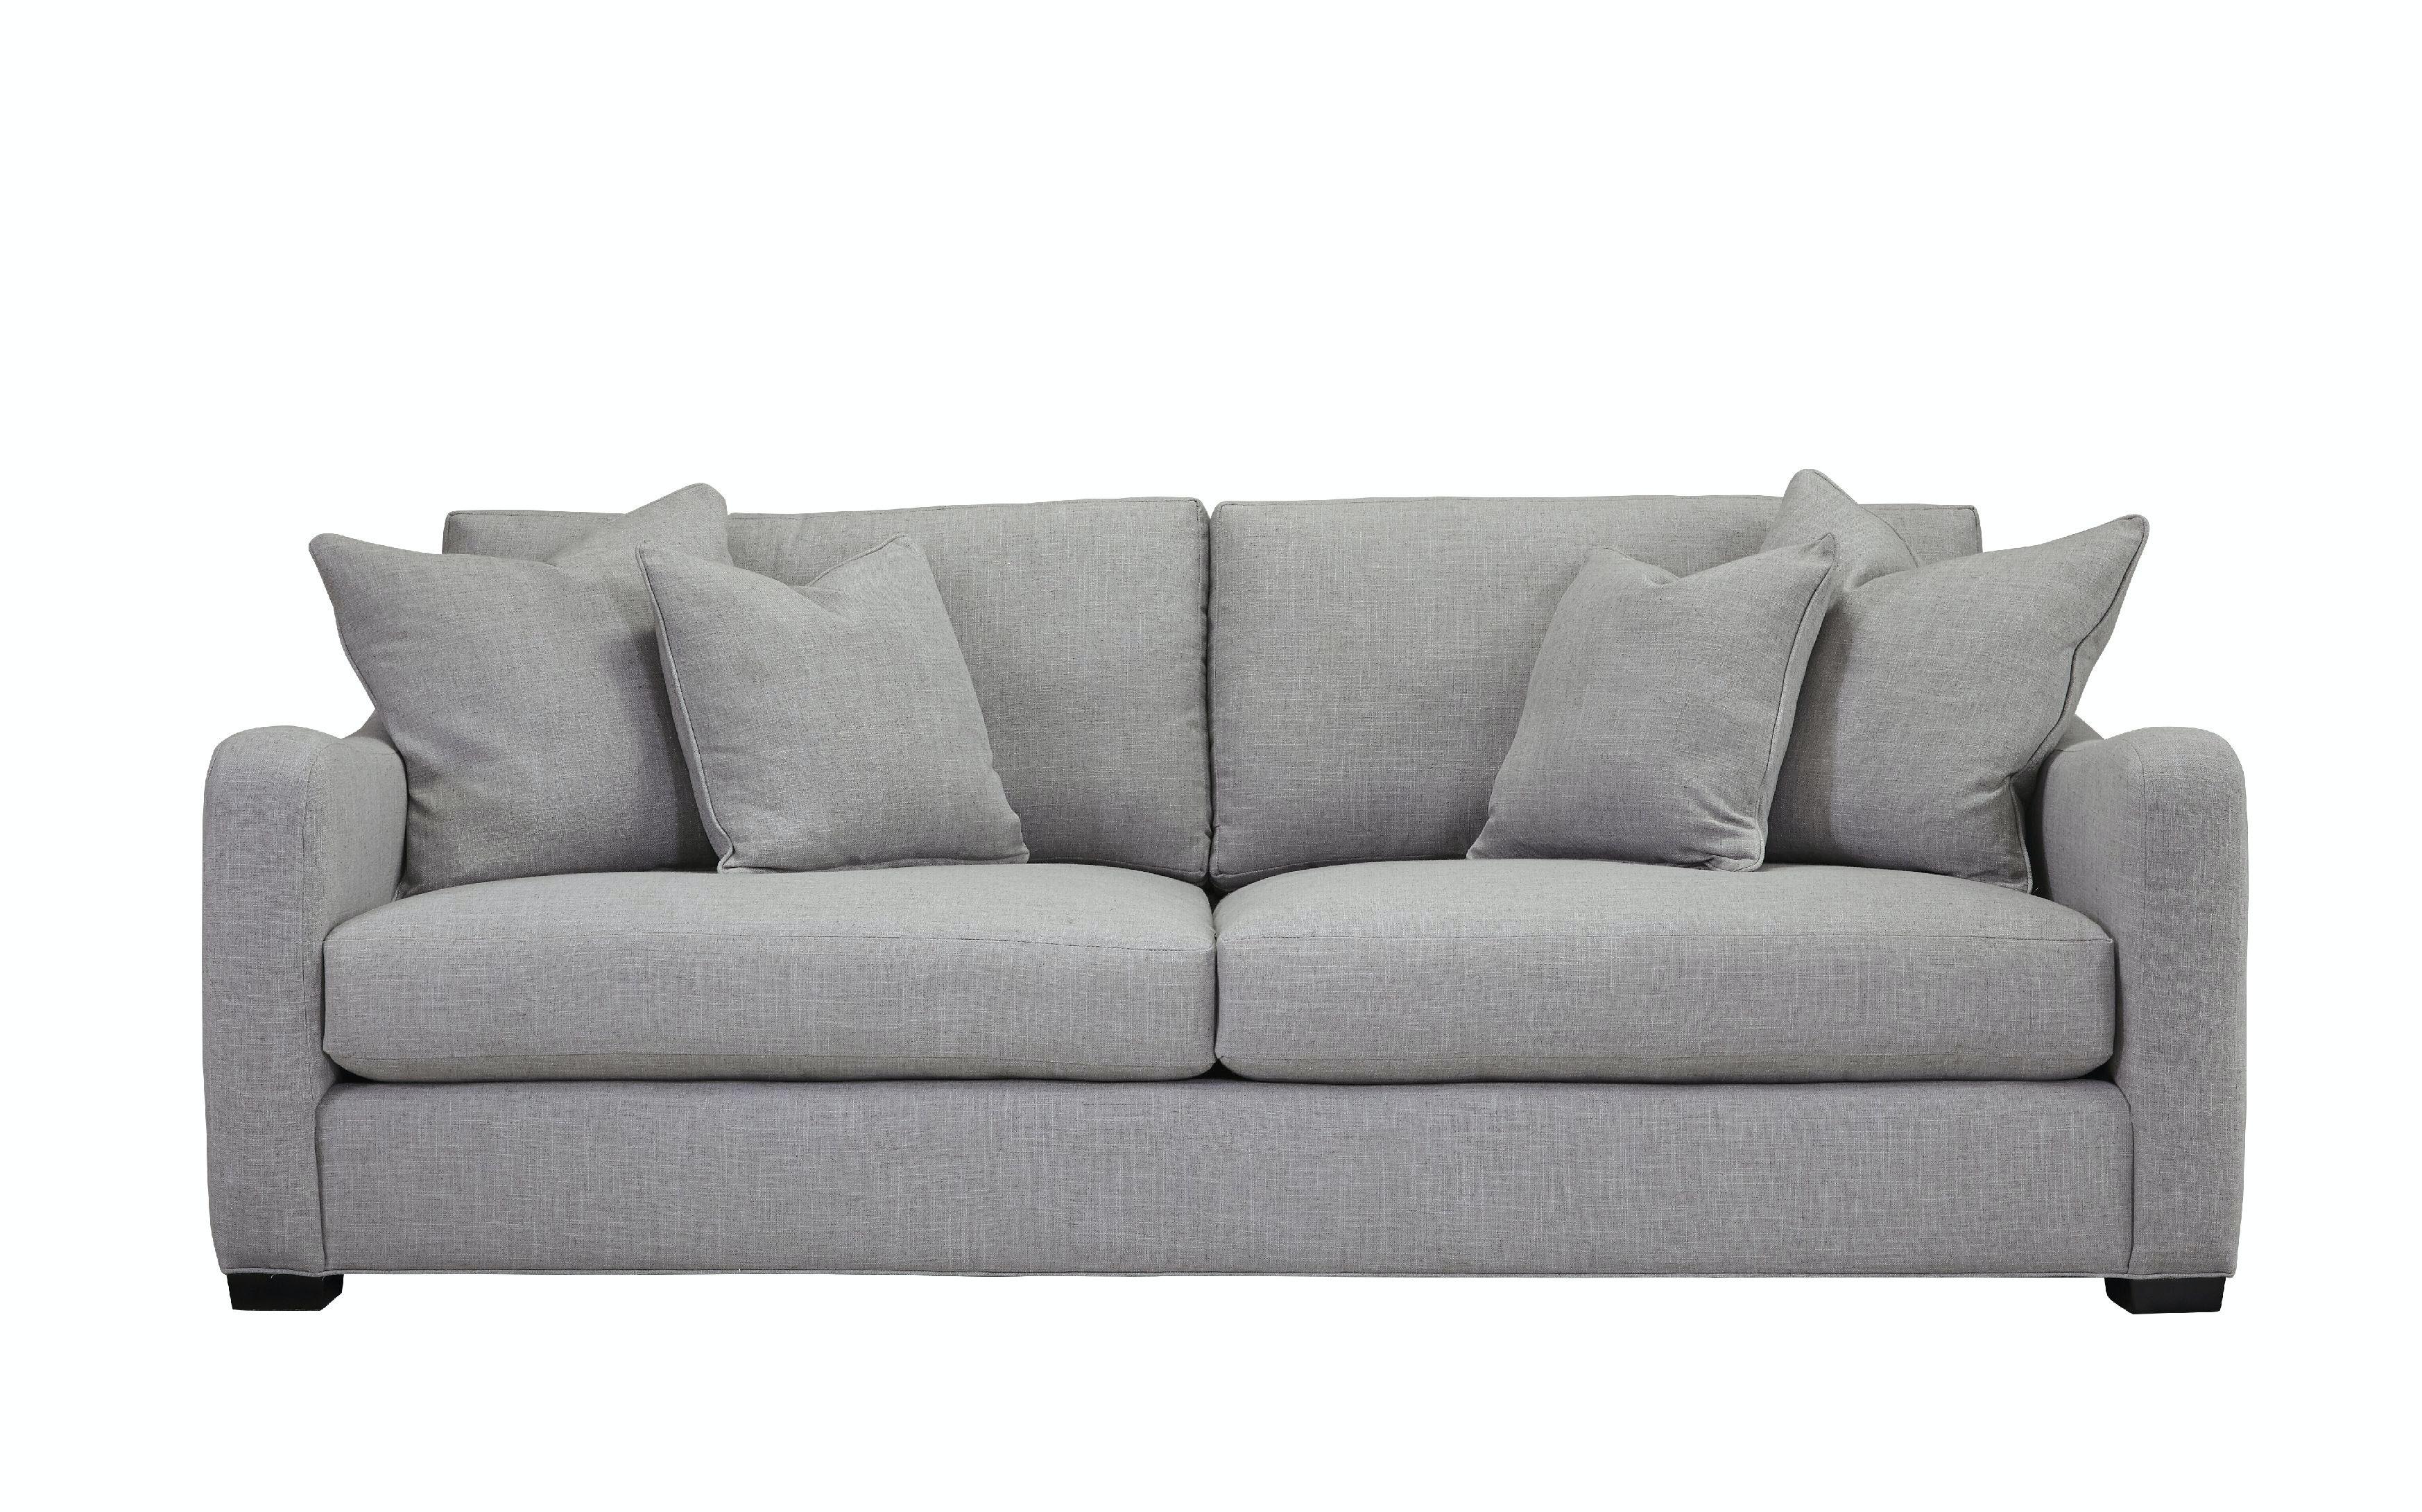 Southern Furniture Wiley Sofa 40961